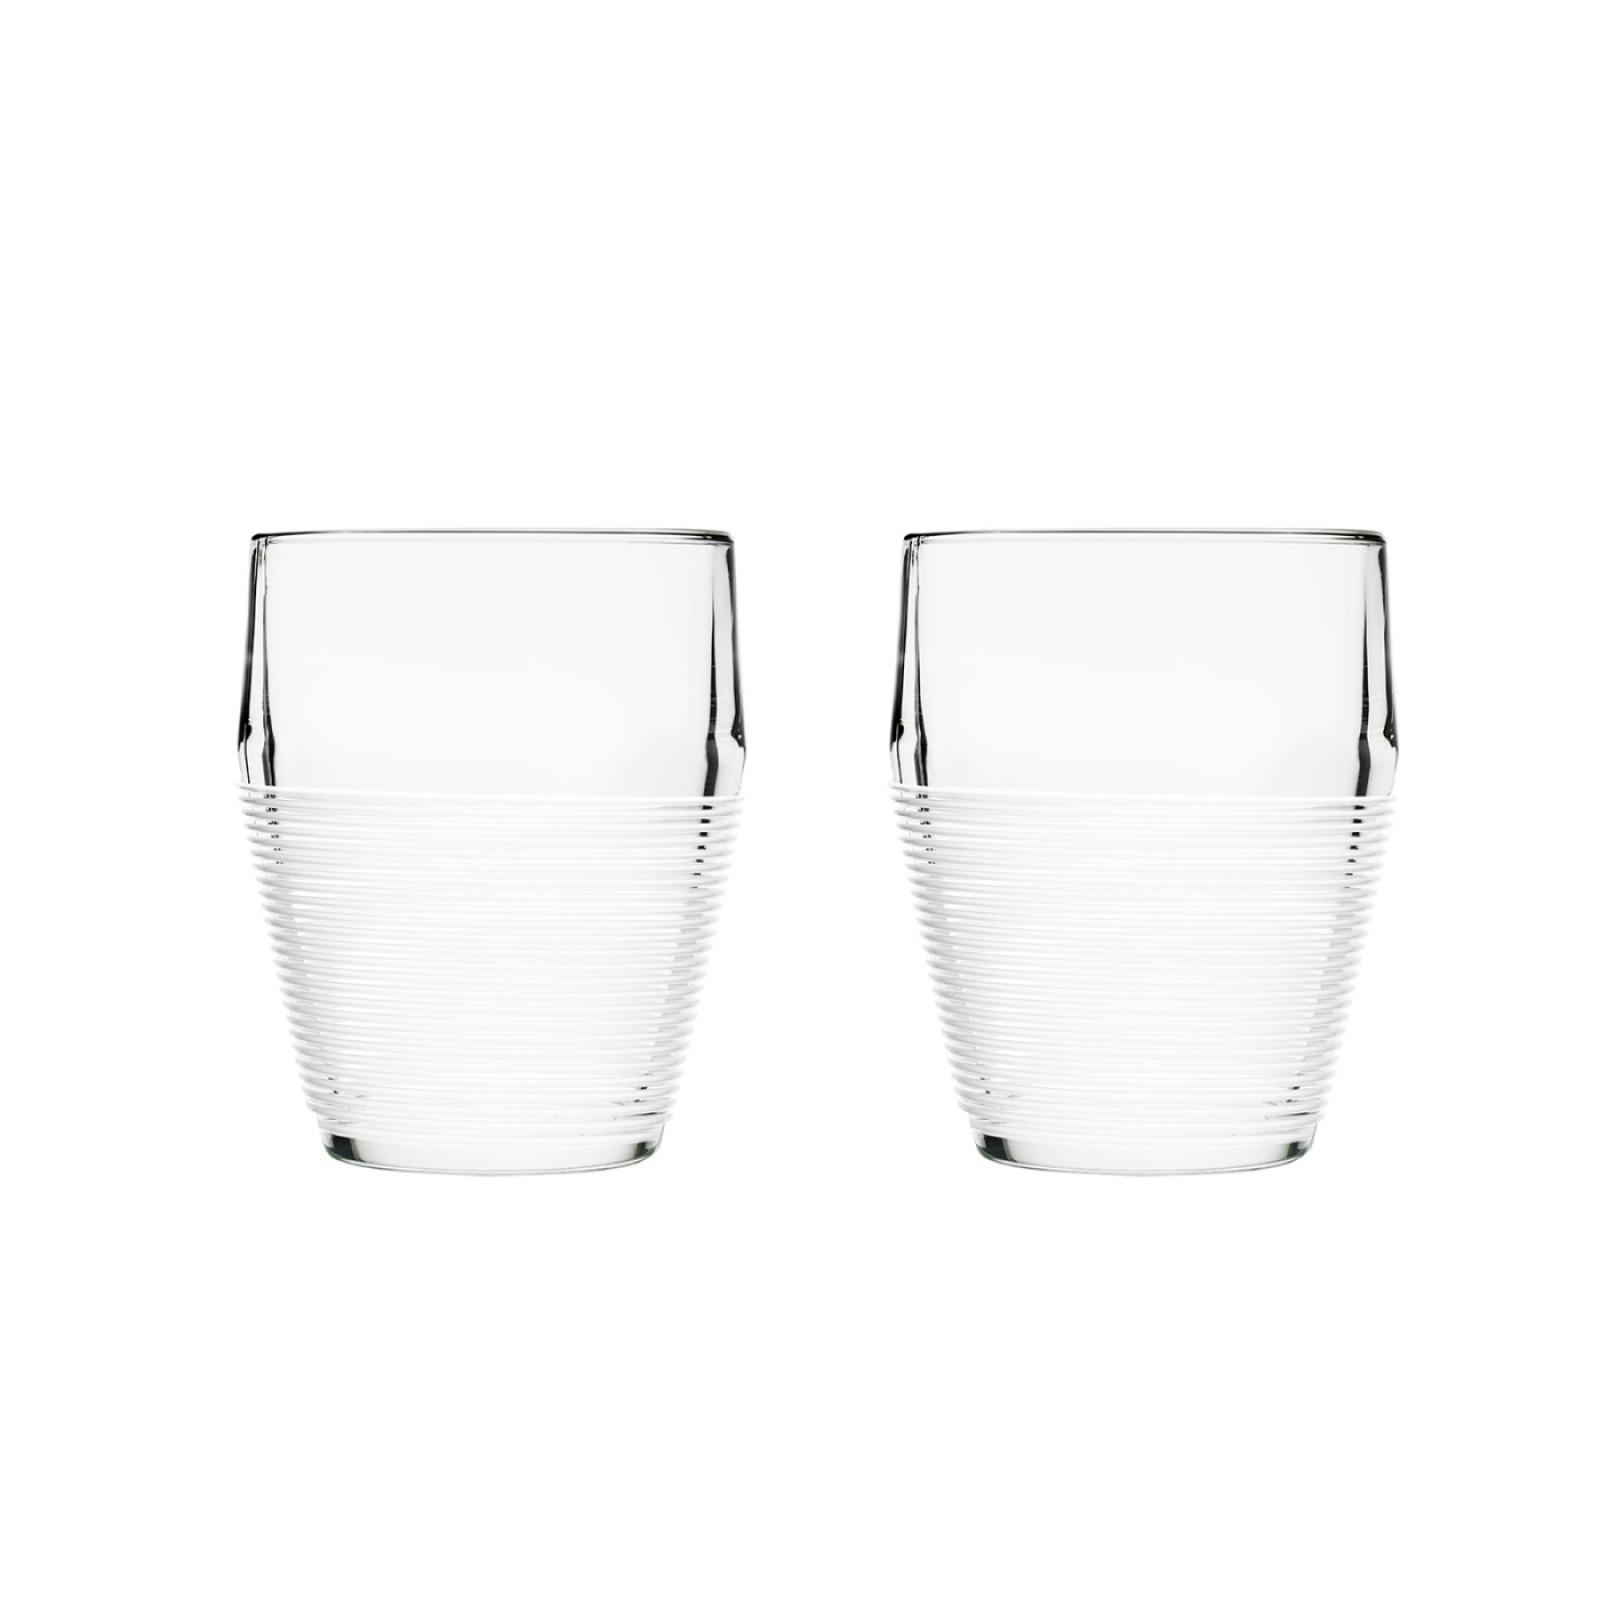 Timo Termo Glasses White (Set of 2) - Design House Stockholm